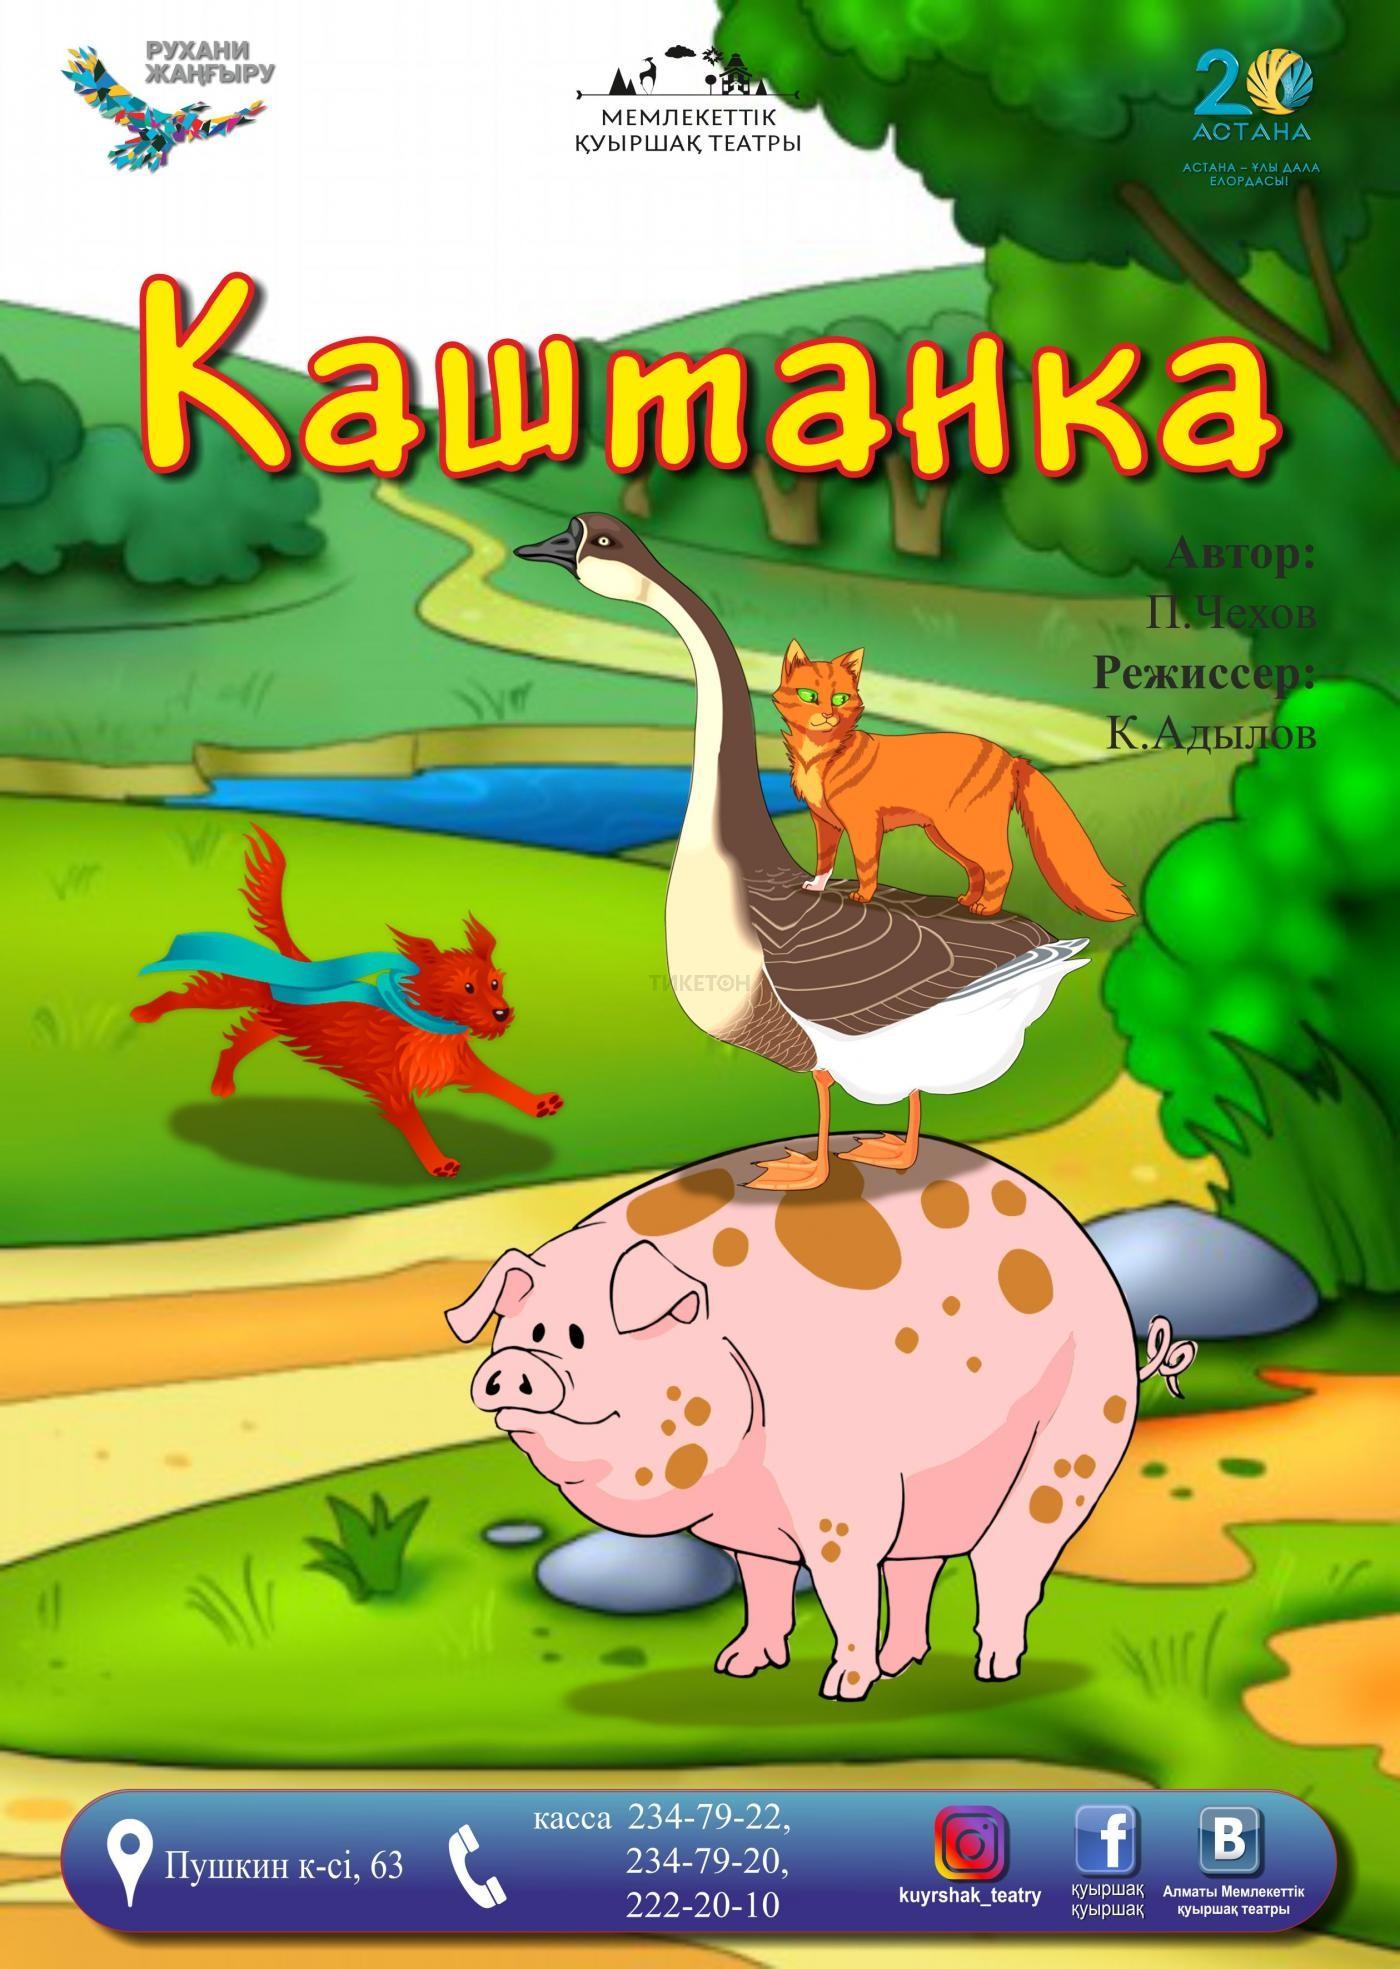 Каштанка, театр кукол Алматы